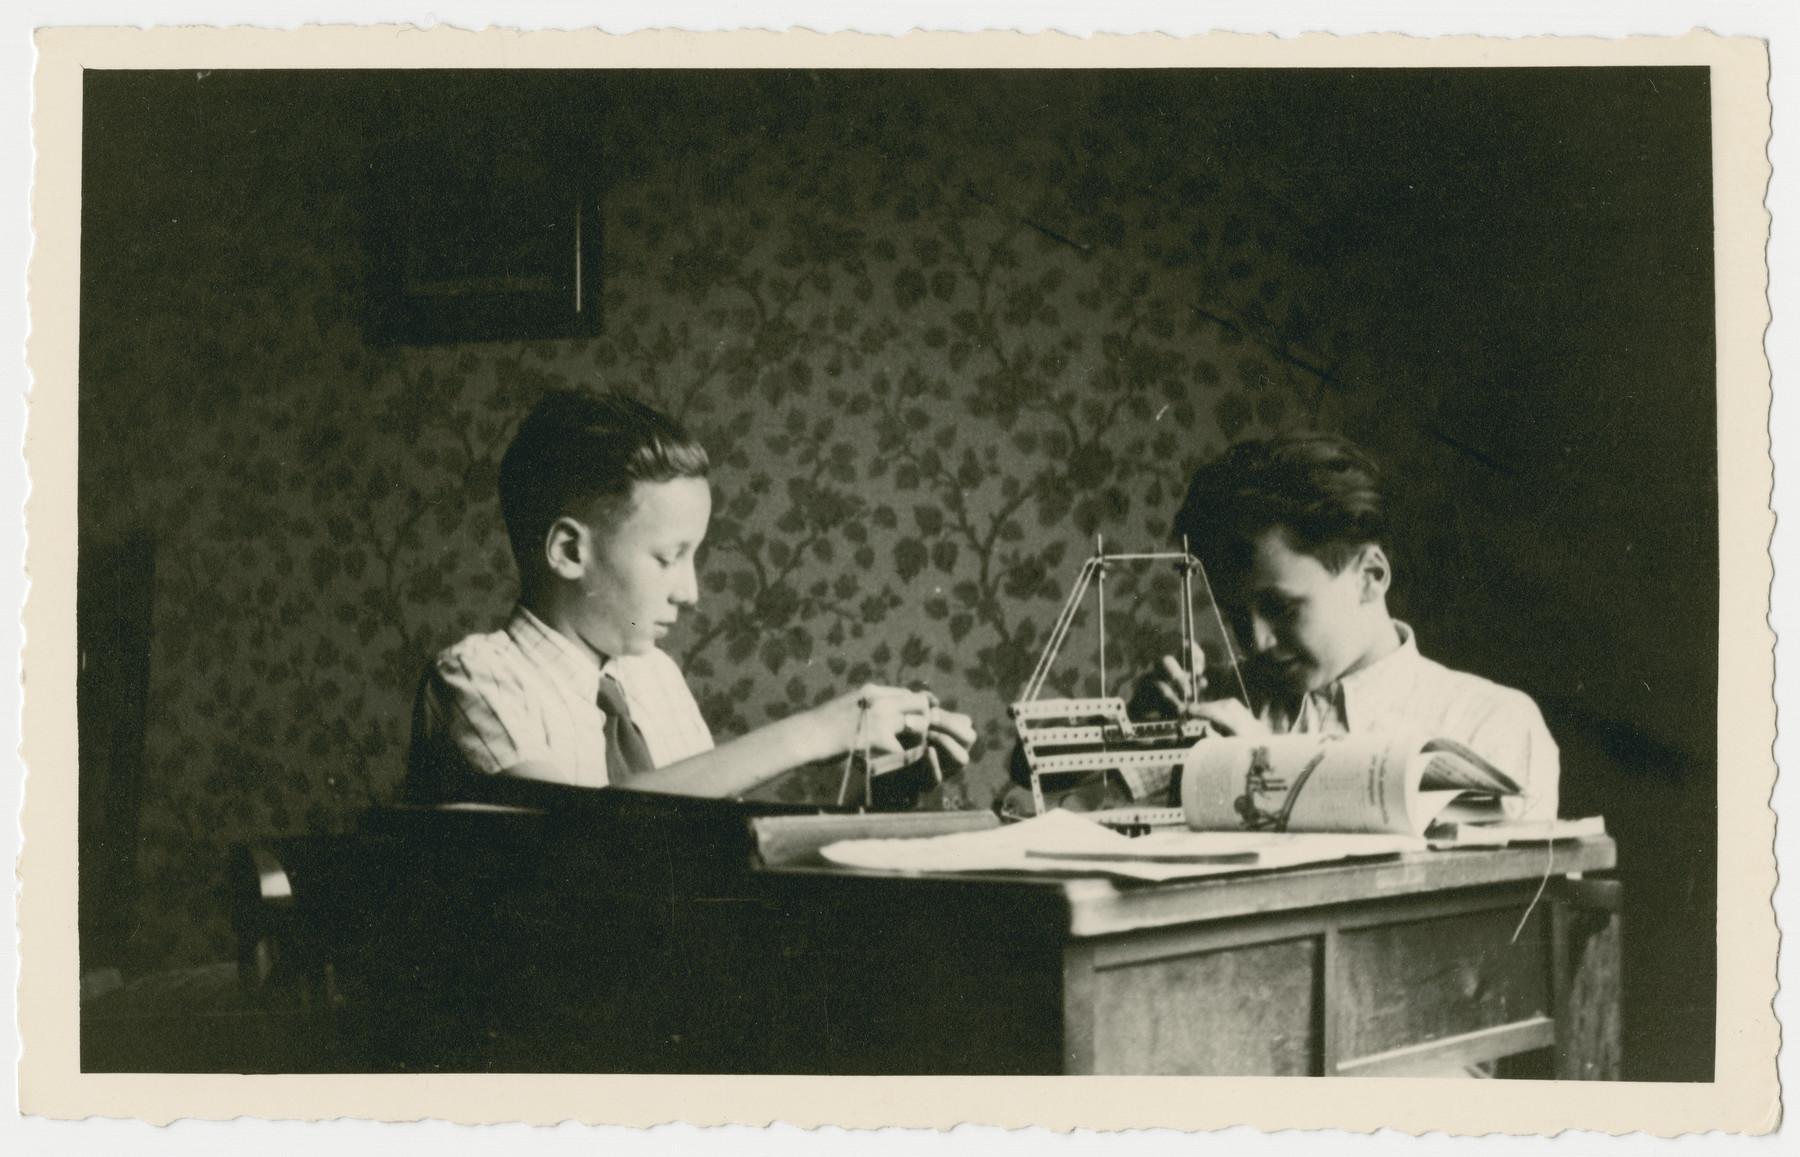 Daniele and Leonardo Nacamu play with a Meccano construction set in their home in Bologna.